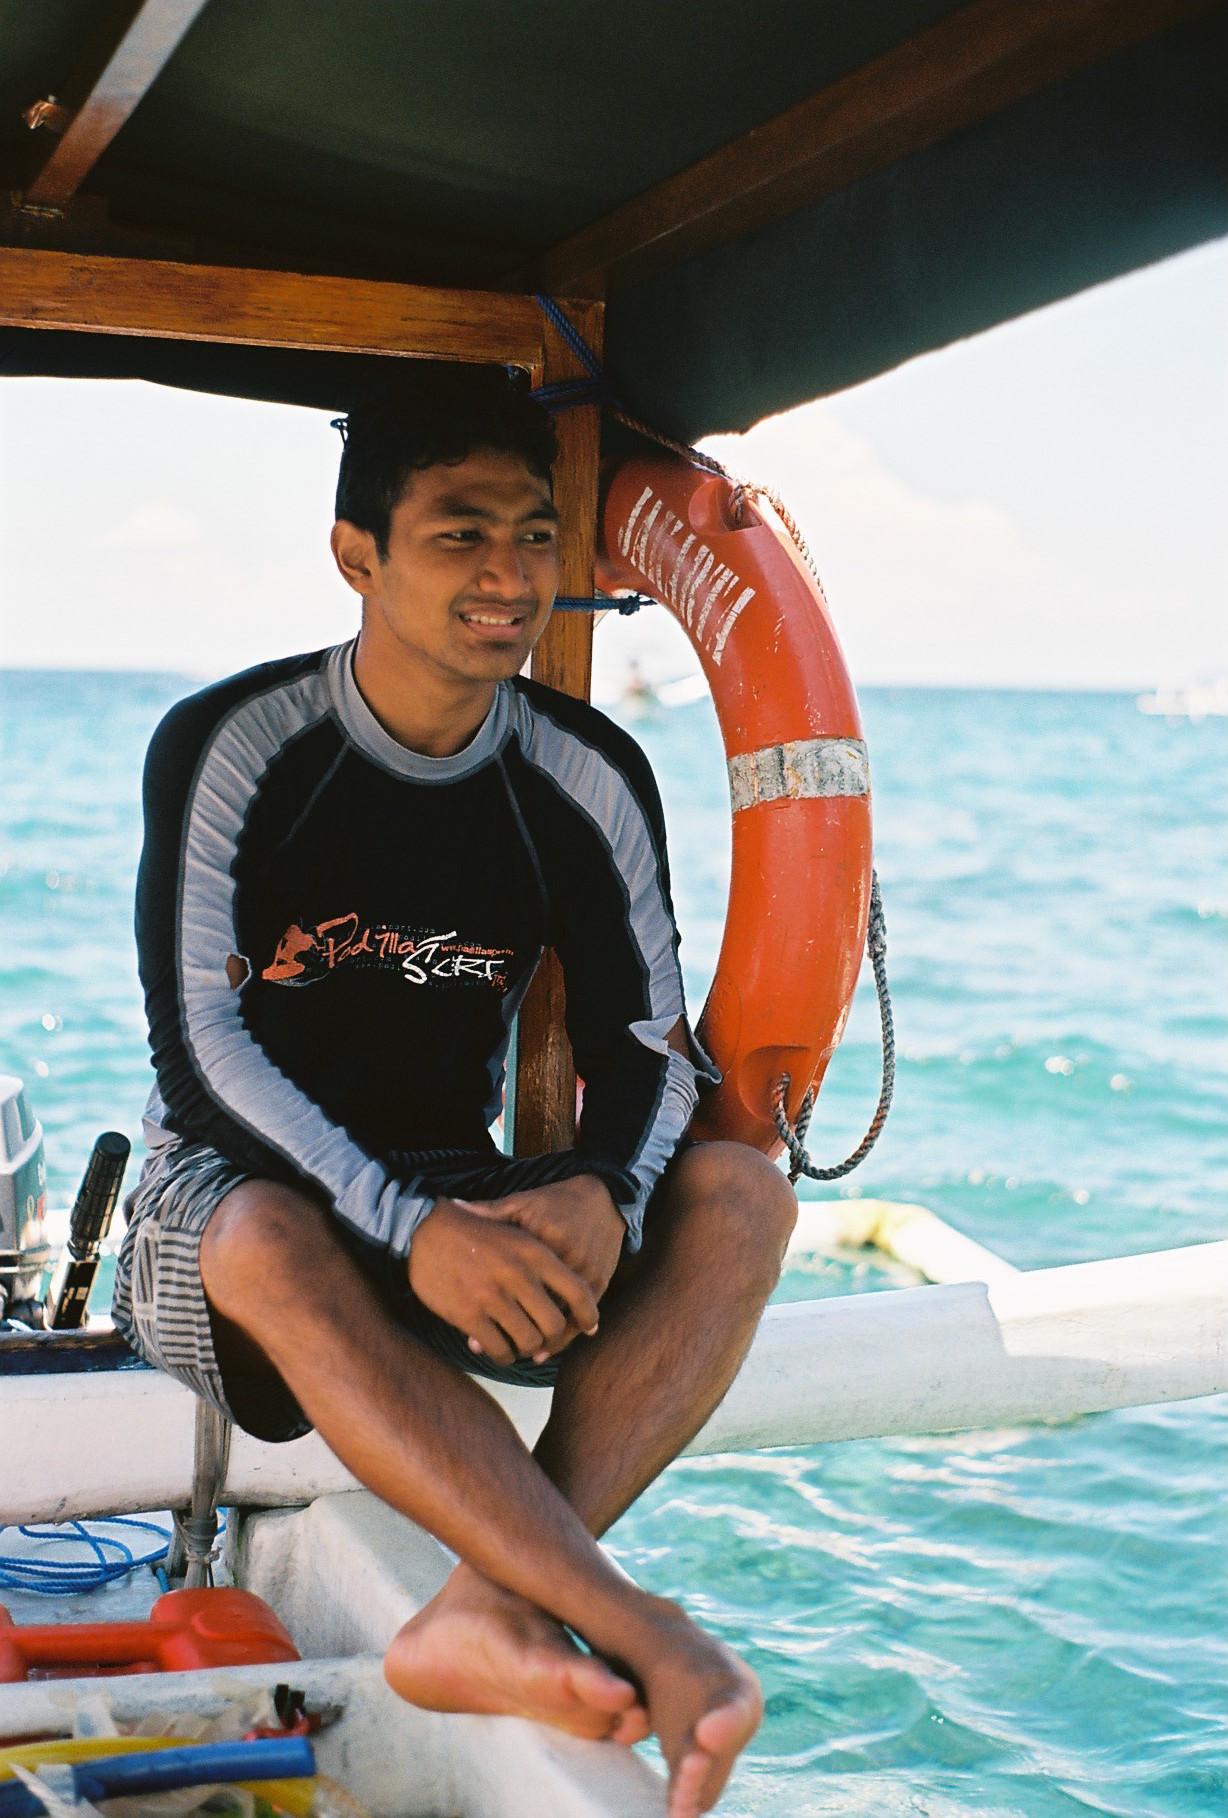 Padangbai Bali Tour Guide Analogue Travel Photography